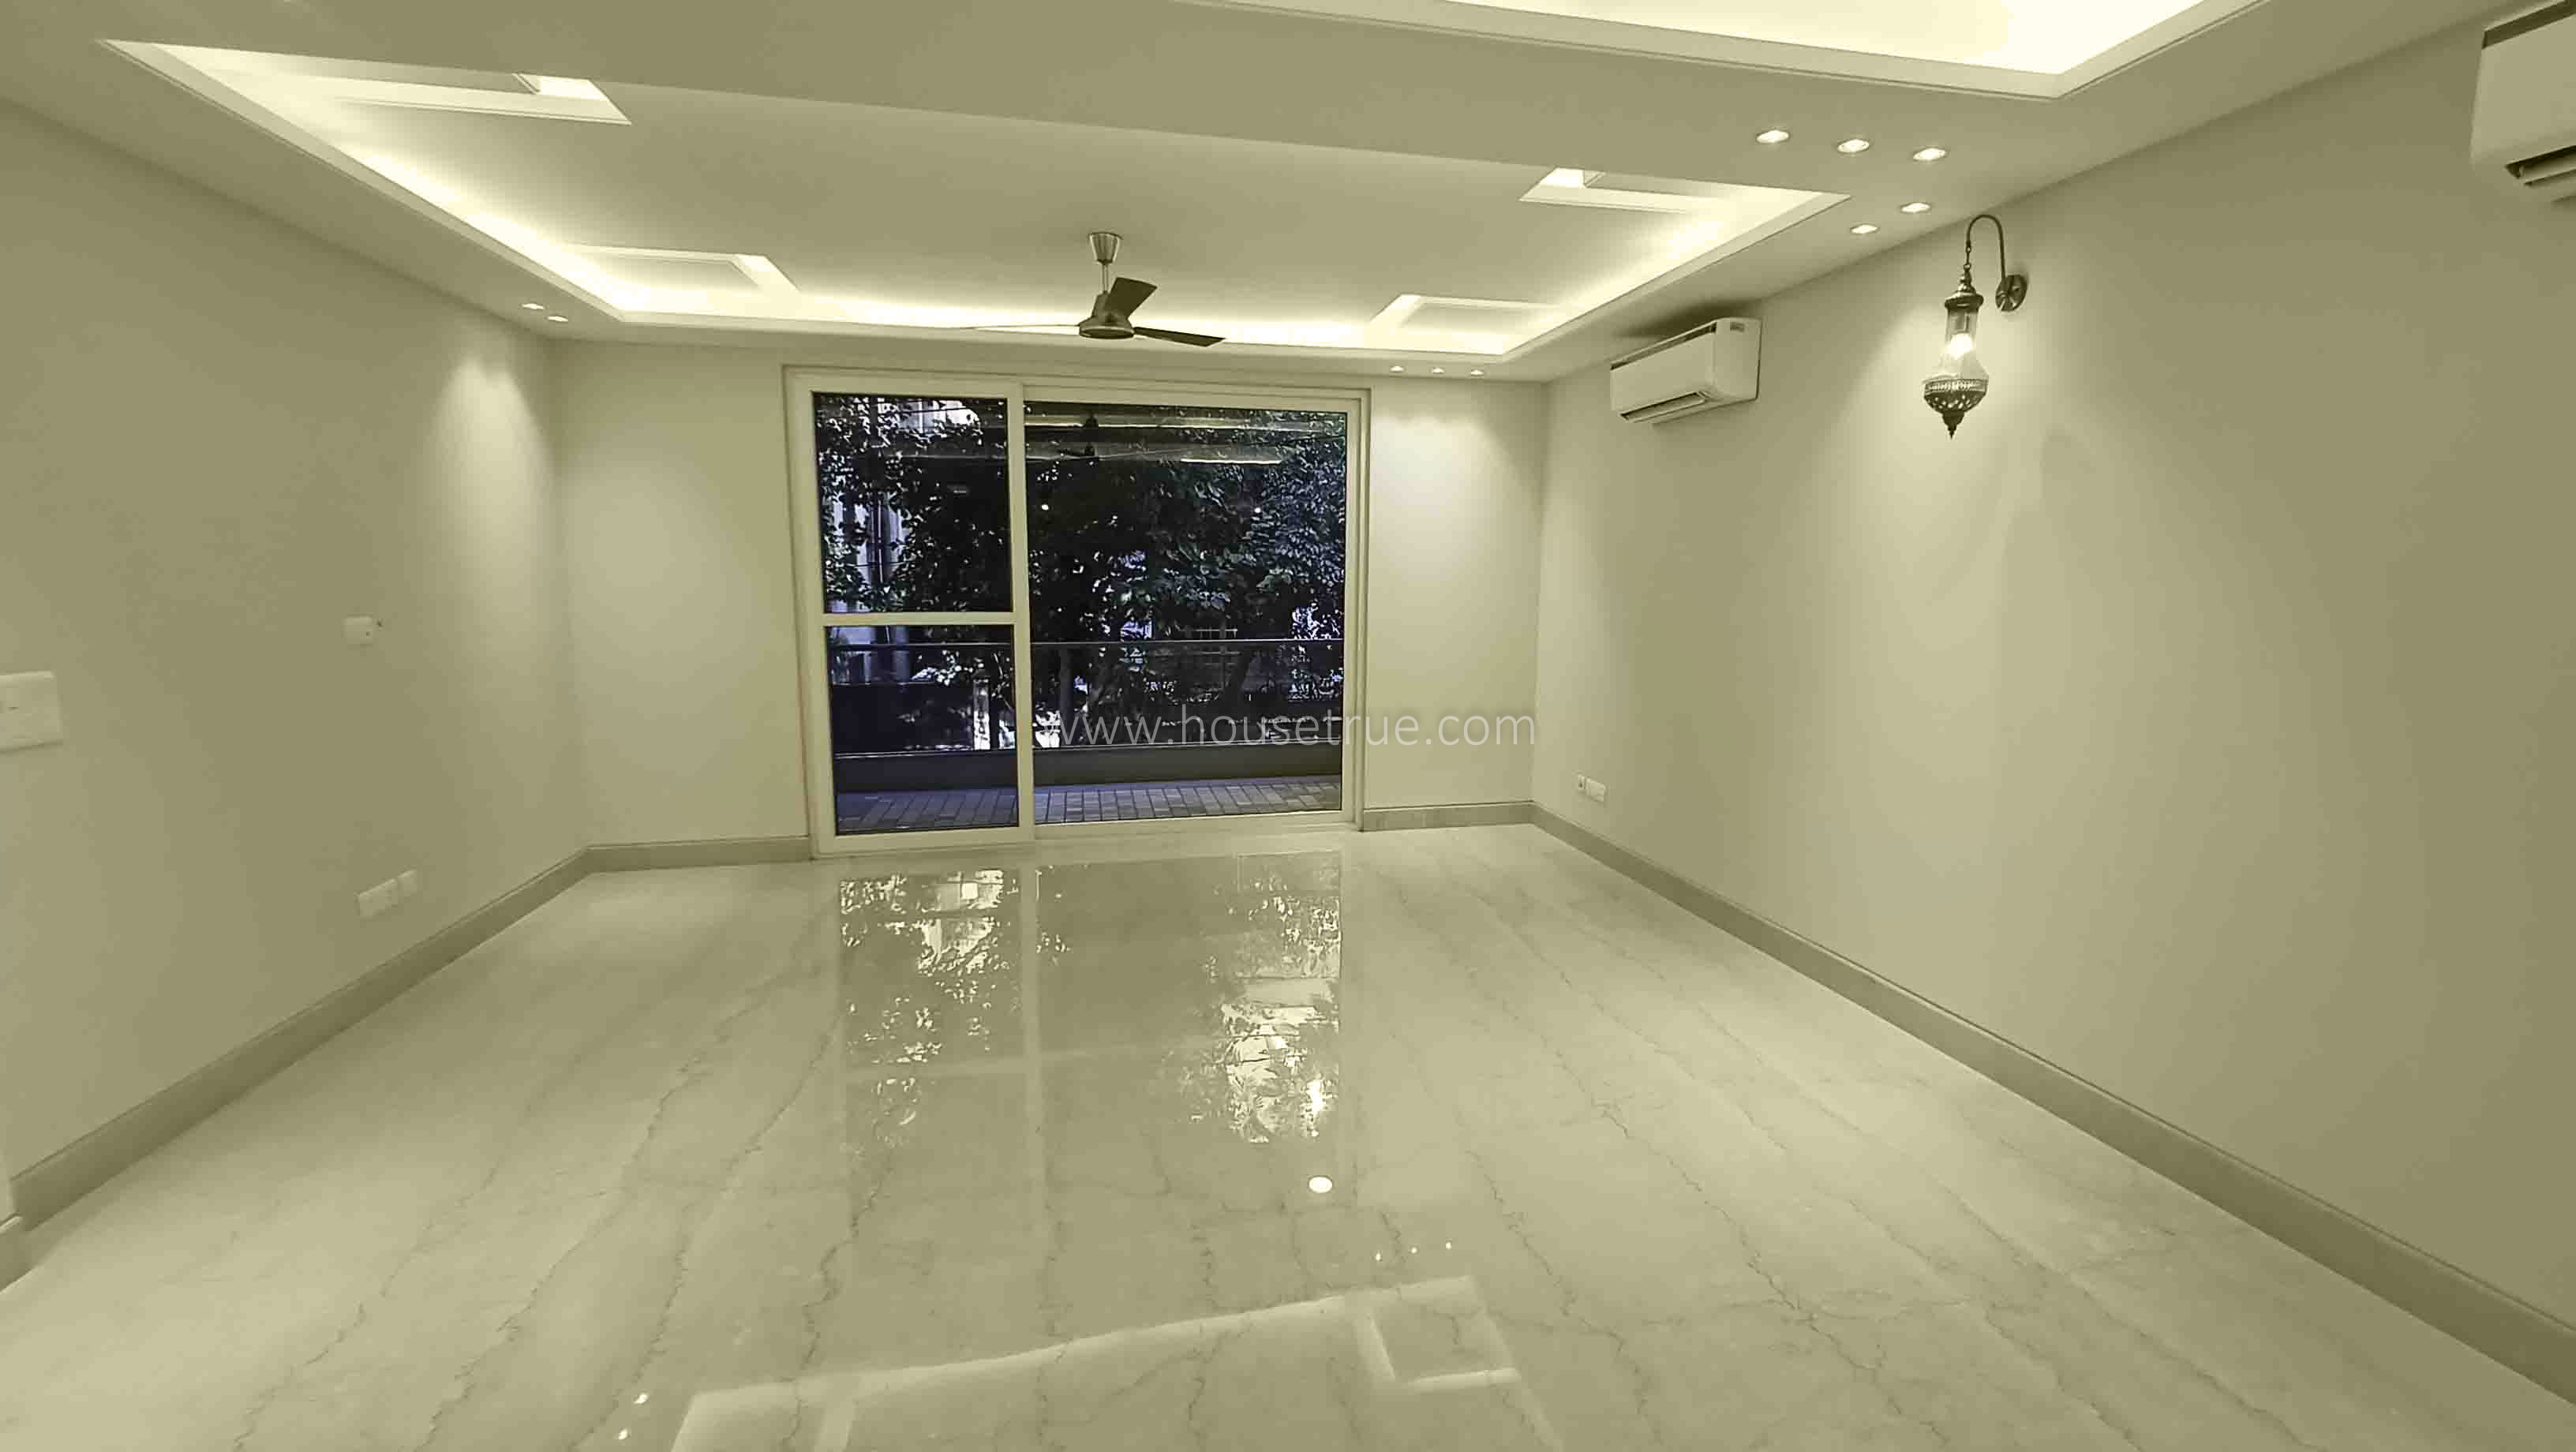 Unfurnished-Apartment-Gulmohar-Park-New-Delhi-26226